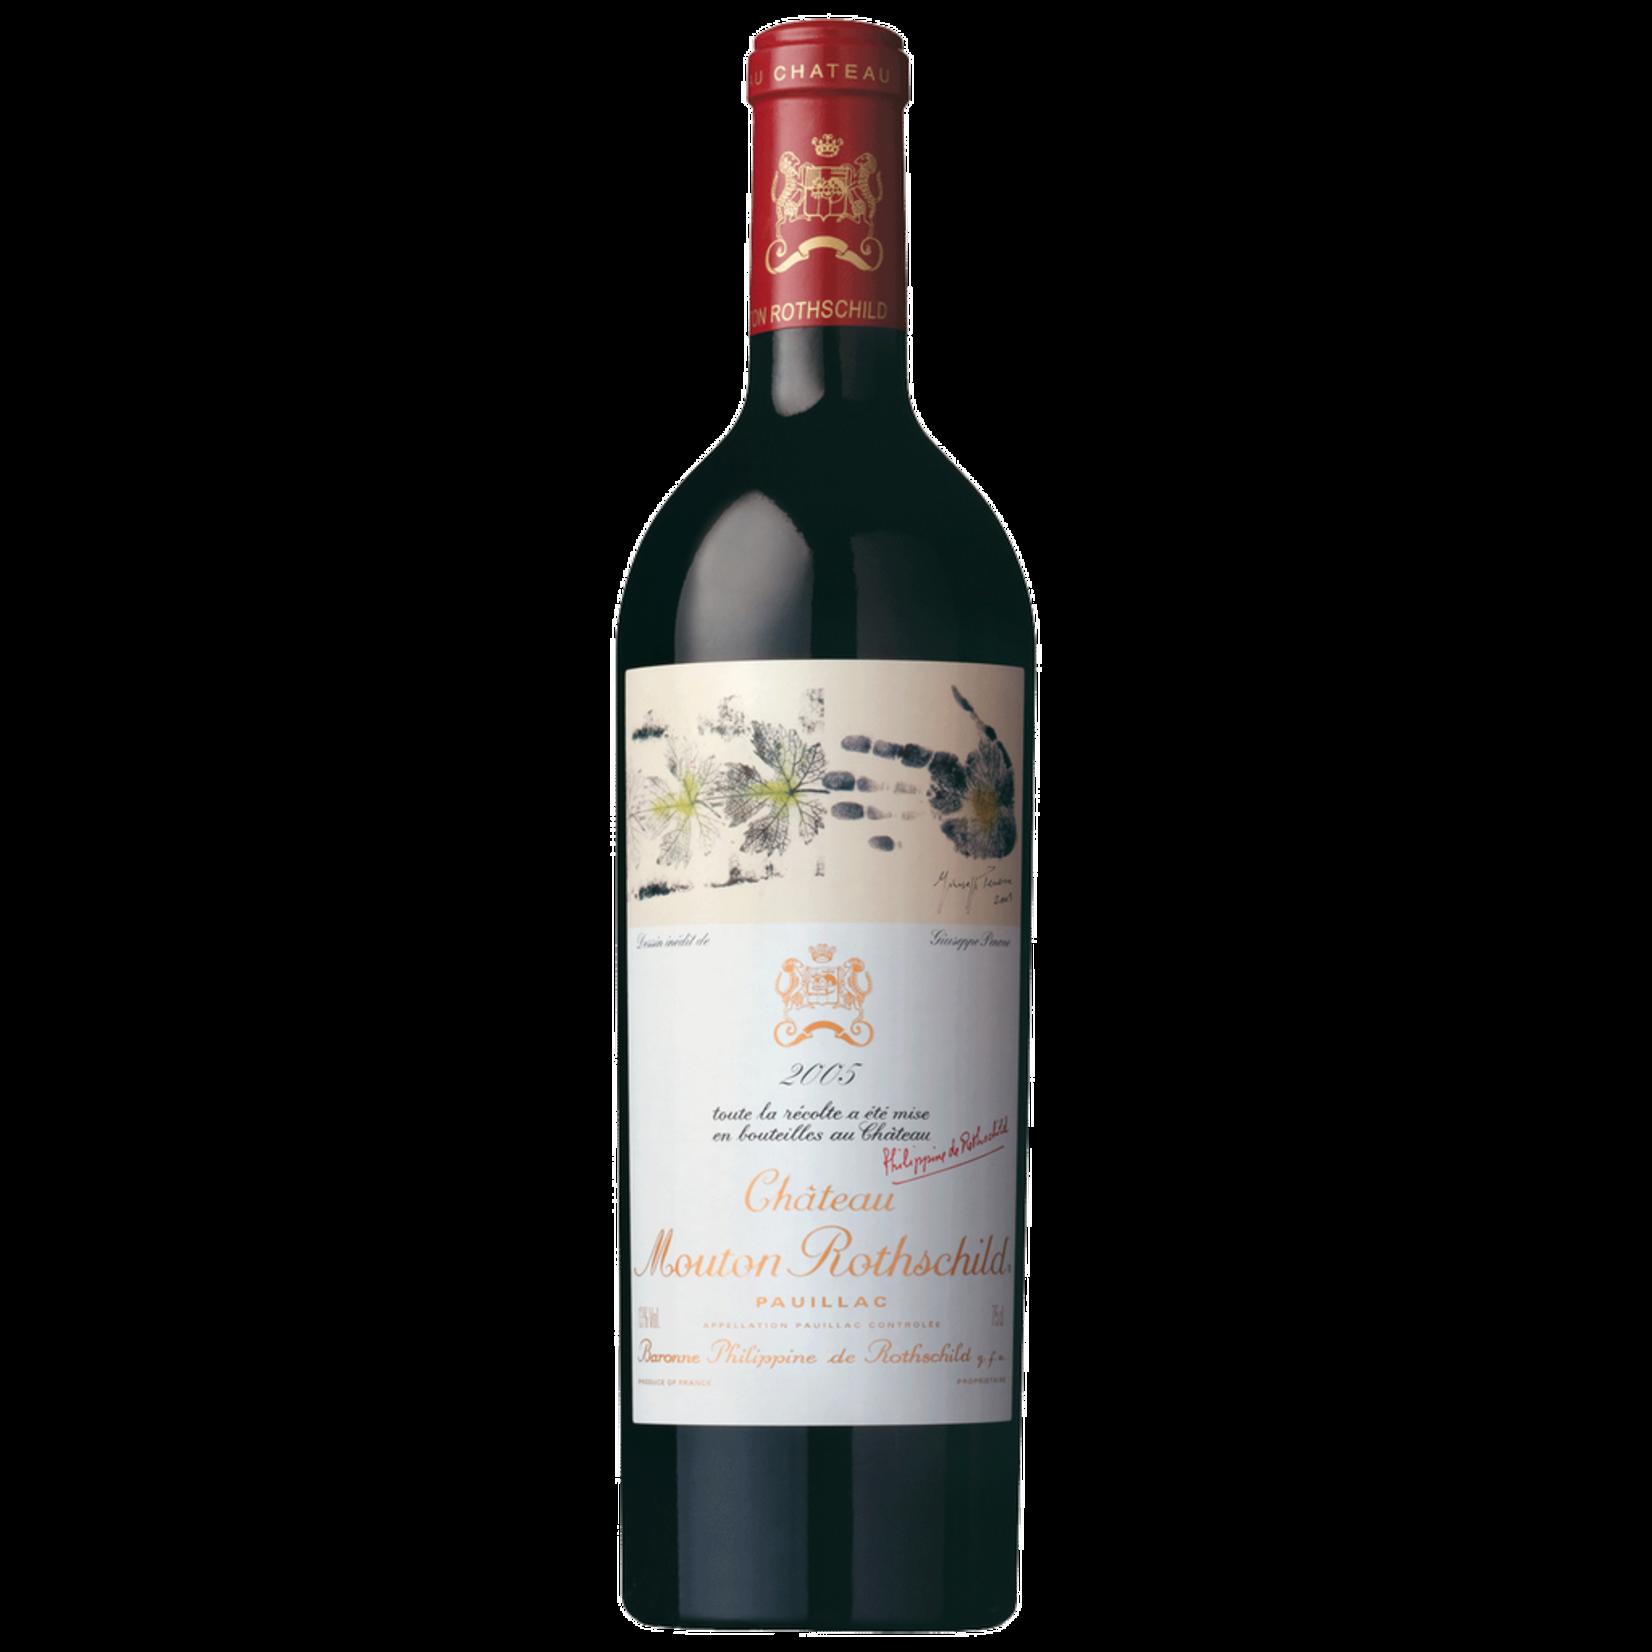 Wine Chateau Mouton Rothschild 2005